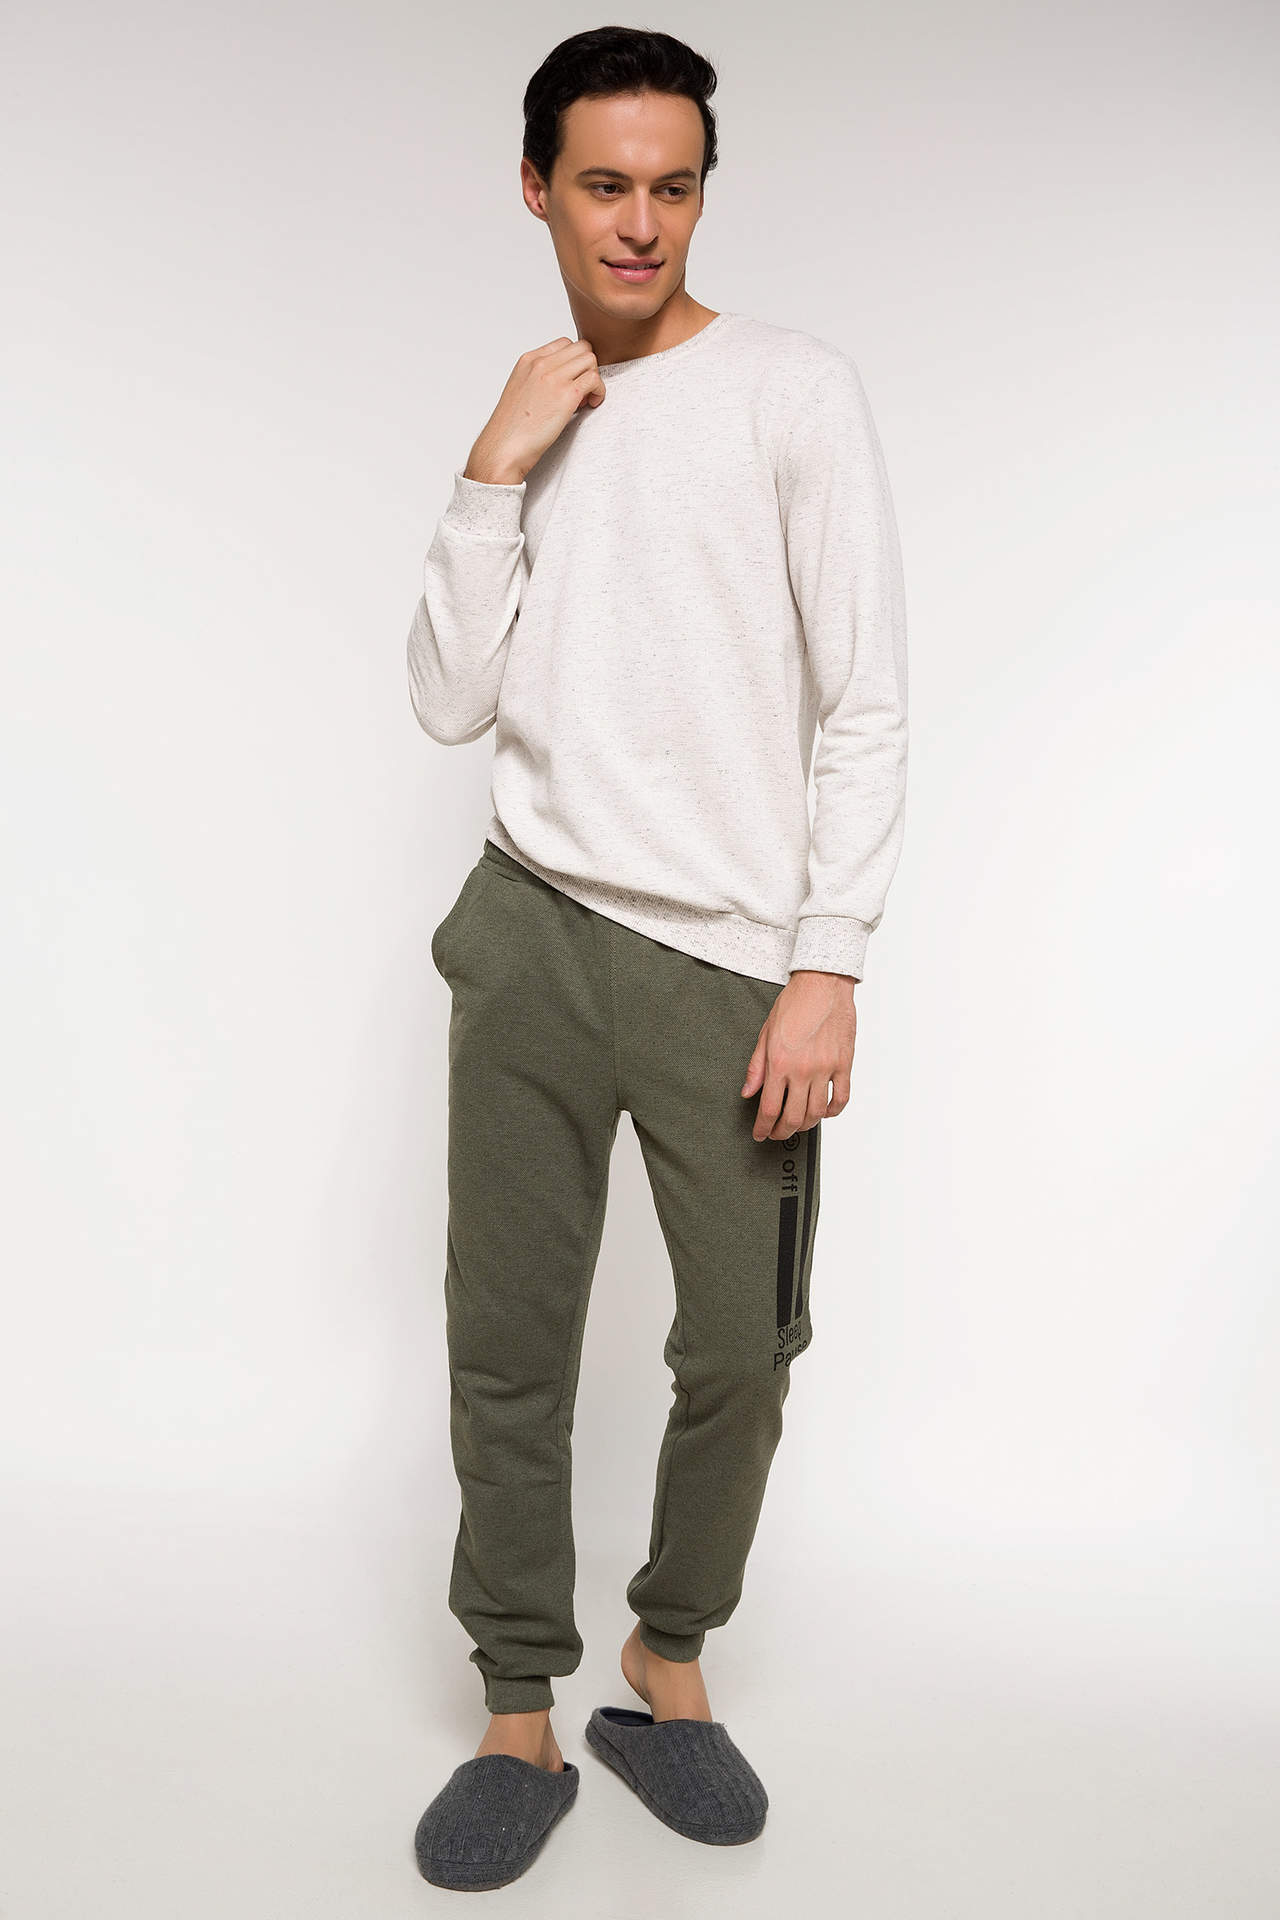 DeFacto Erkek Slim Fit Pijama Takımı Haki male